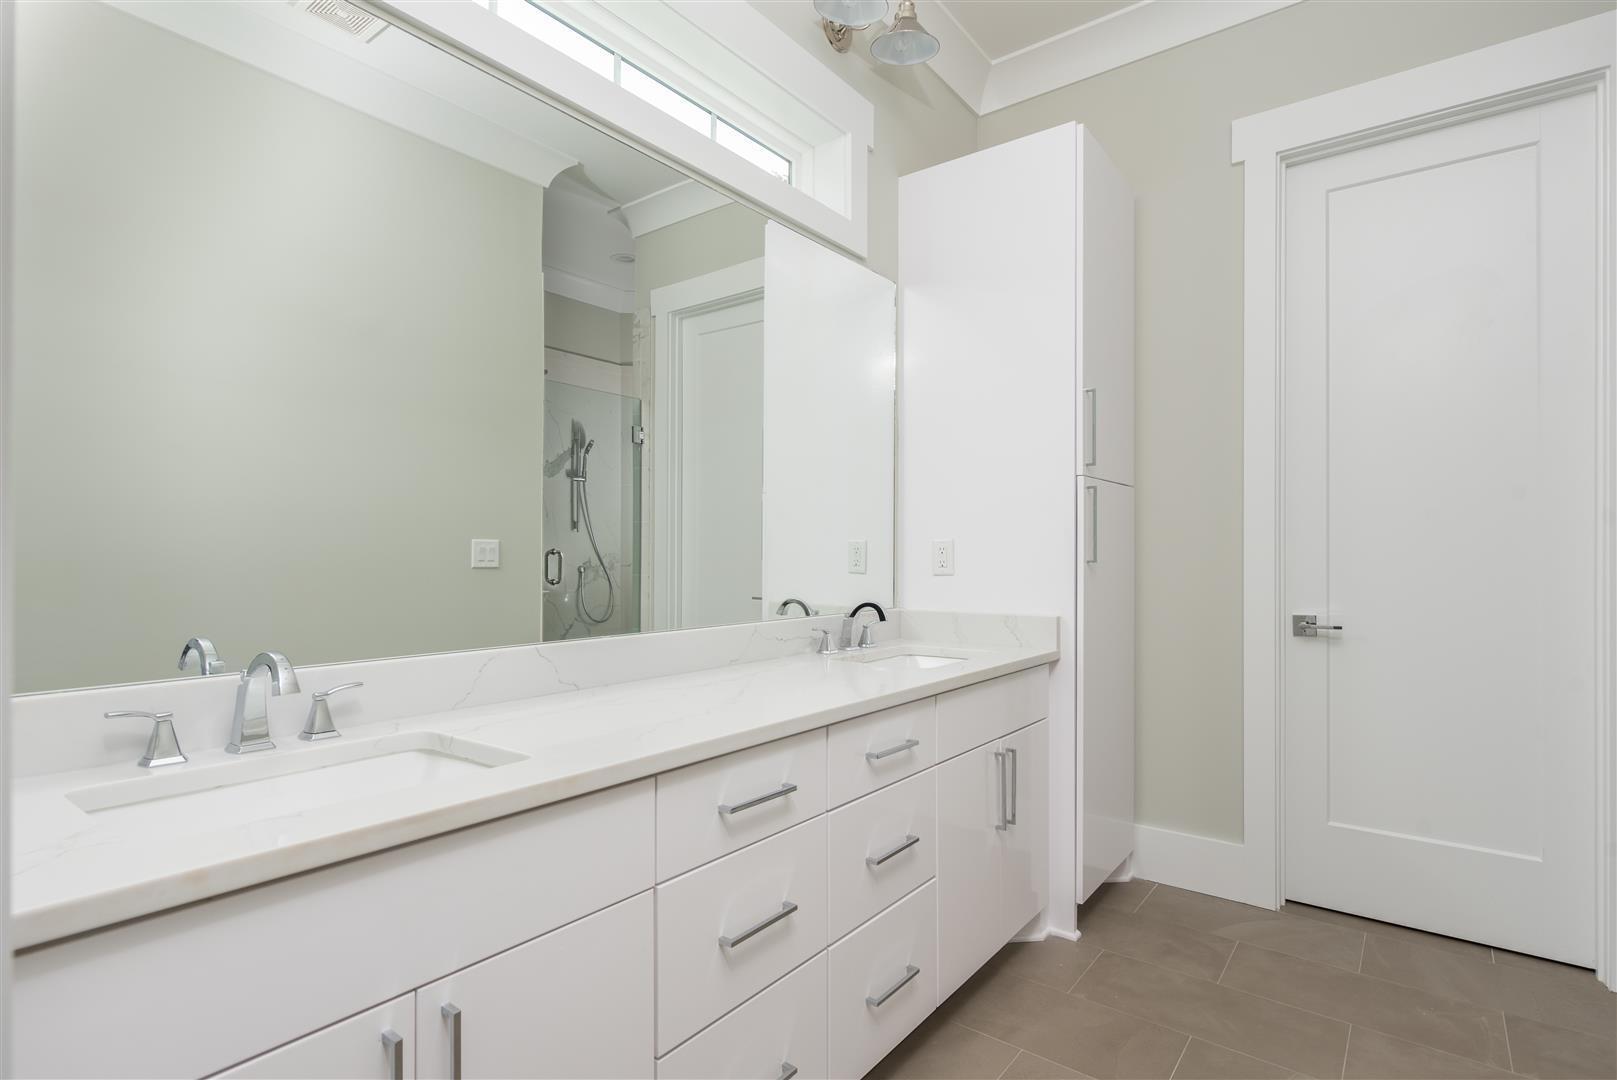 Scanlonville Homes For Sale - 160 5th, Mount Pleasant, SC - 8